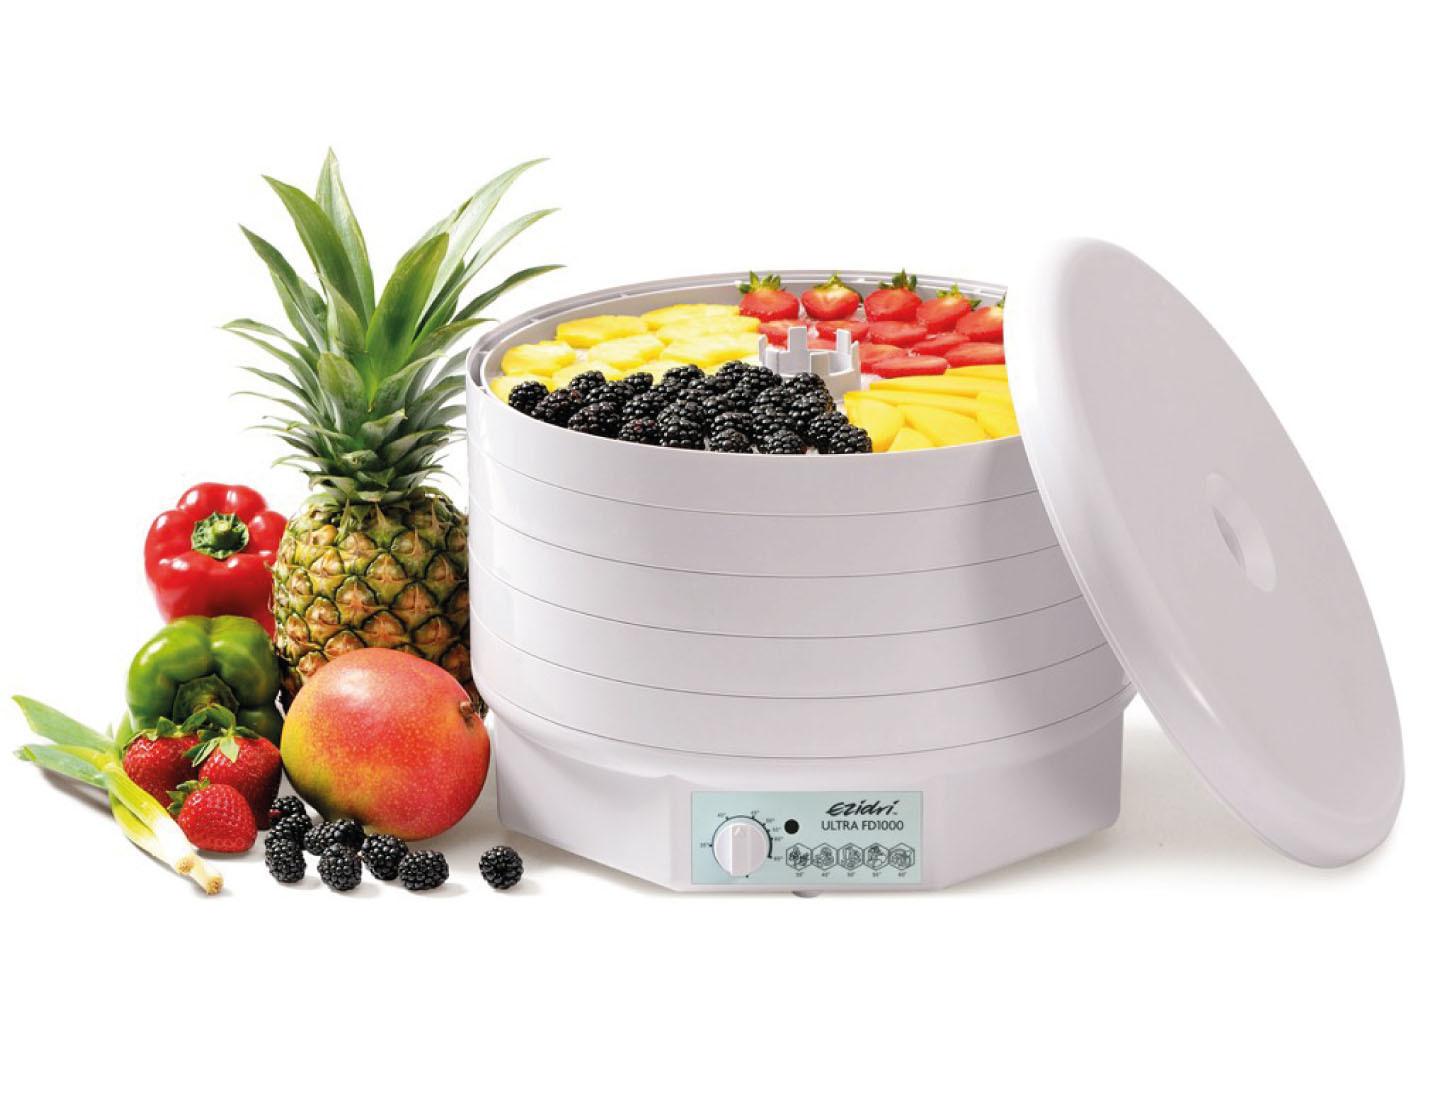 Устройства для сушки фруктов в домашних условиях